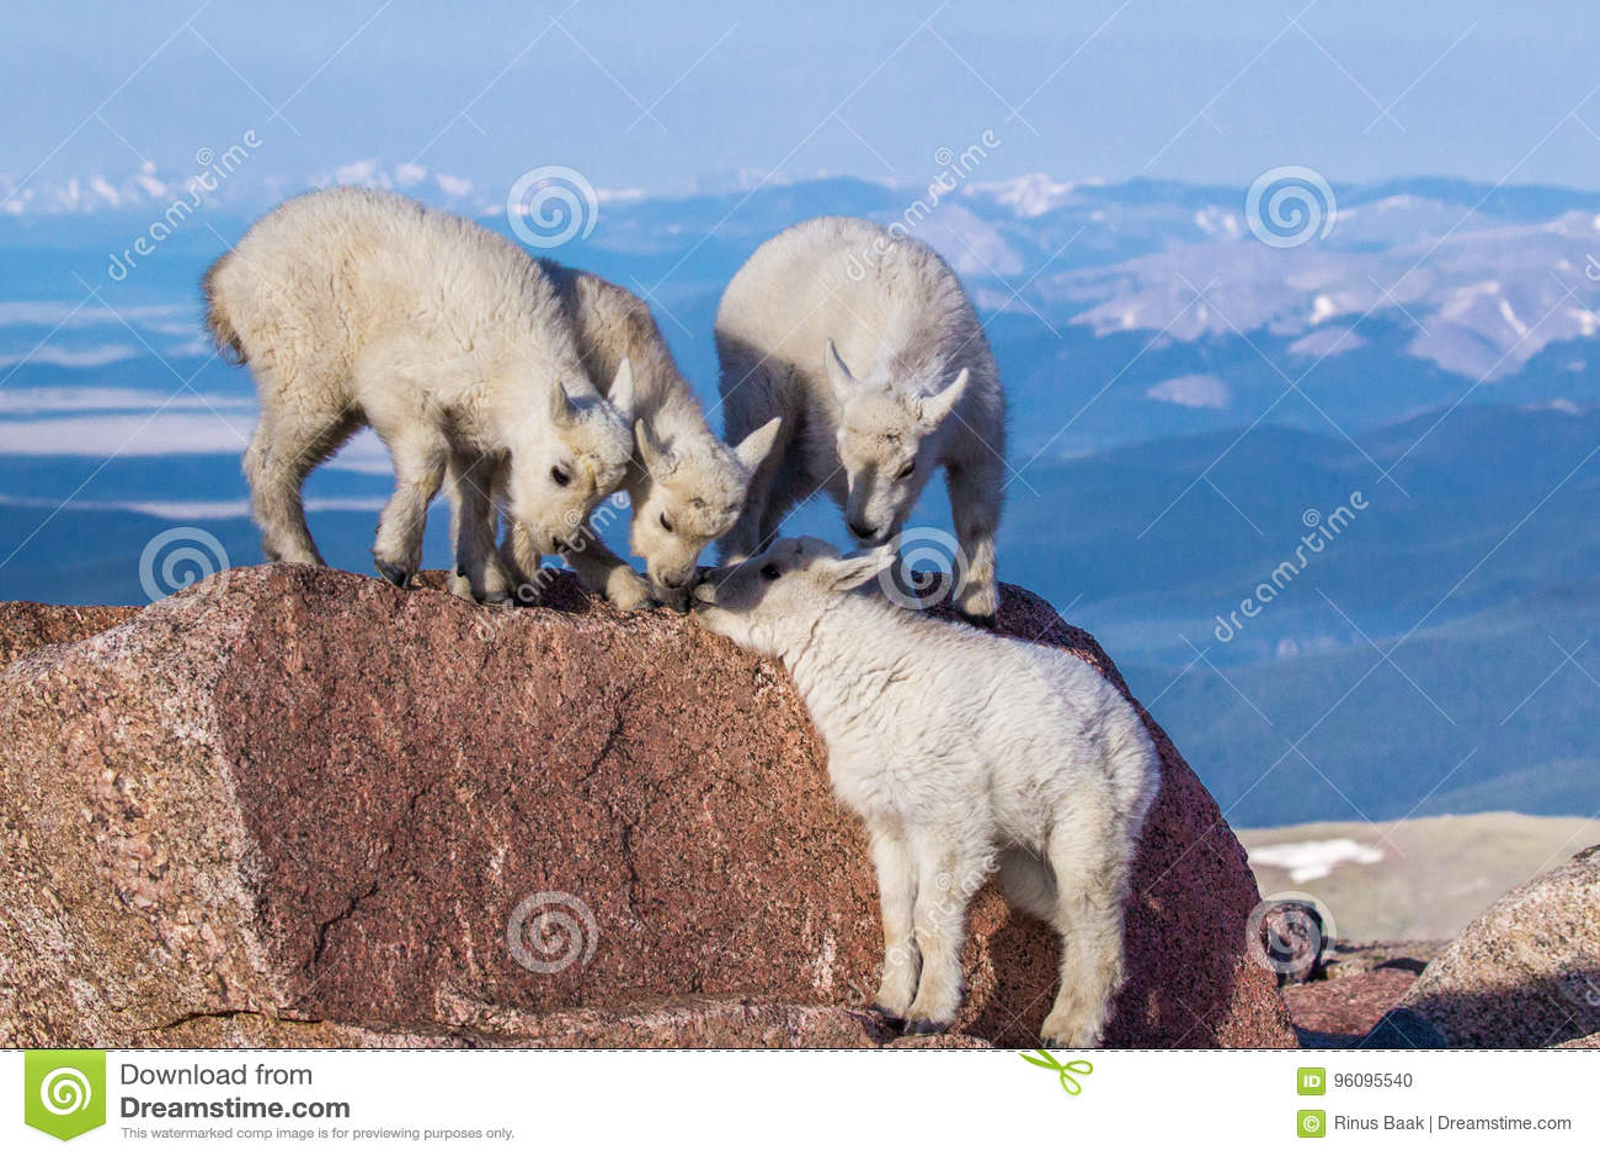 Rocky Mountain Goat Kids